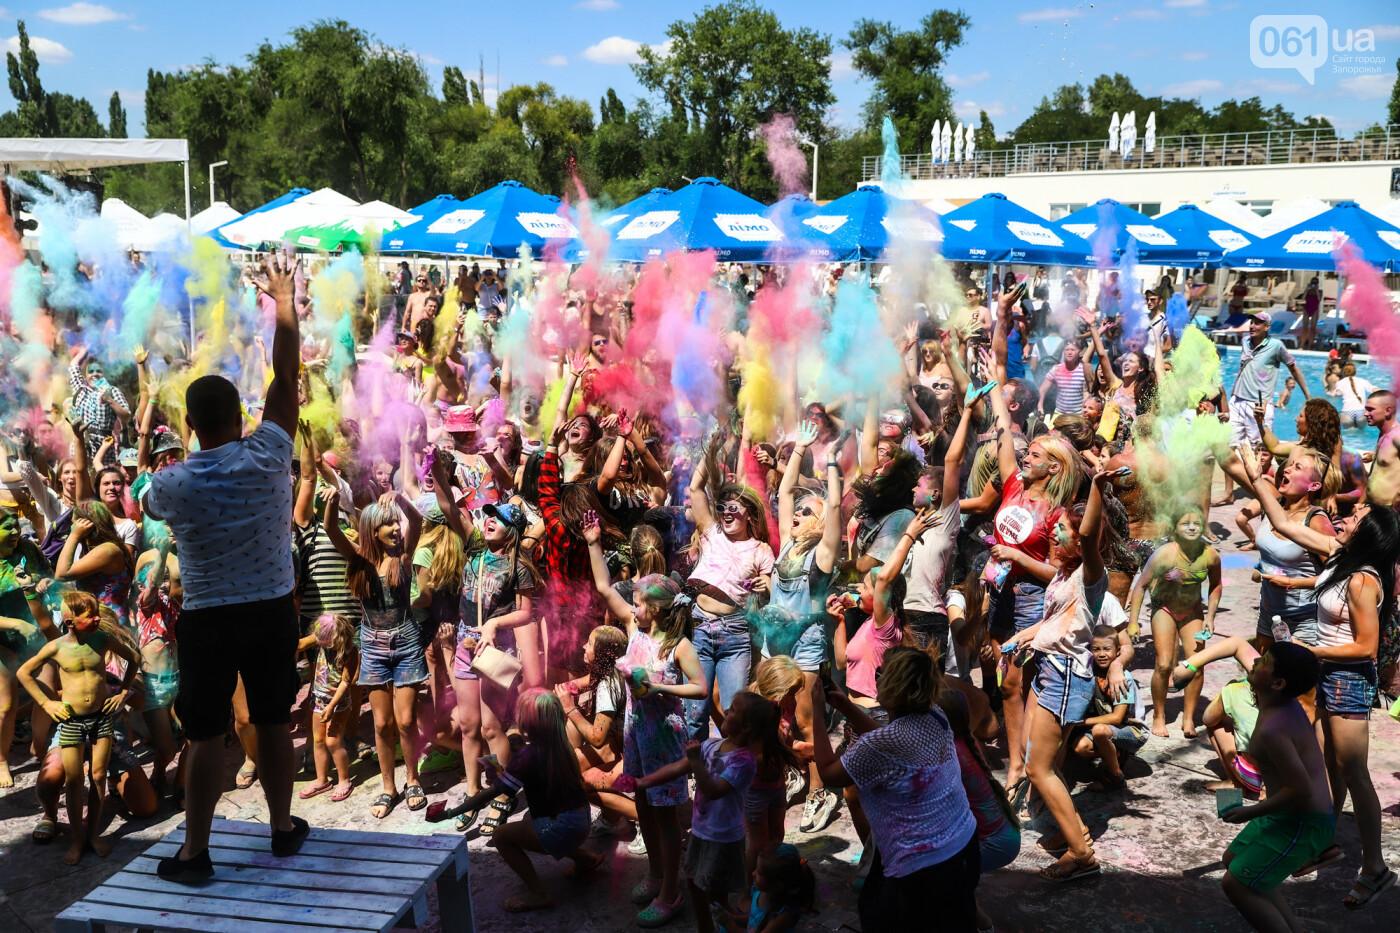 Сотни запорожцев приняли участие в фестивале красок Холи, - ФОТОРЕПОРТАЖ, фото-17